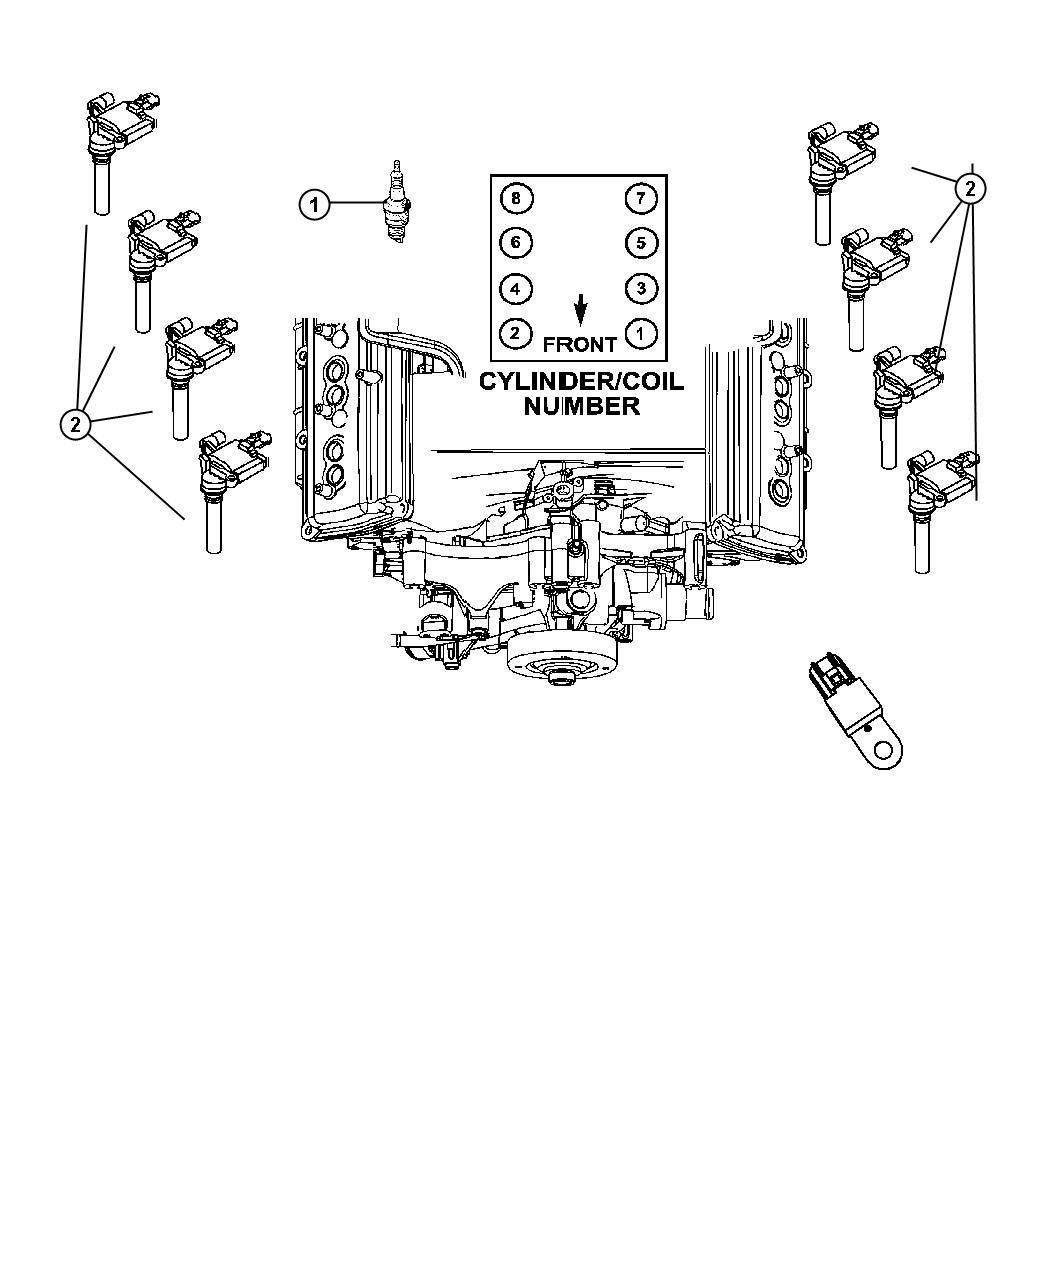 Jeep Grand Cherokee Spark plug. Ignition, plugs, group